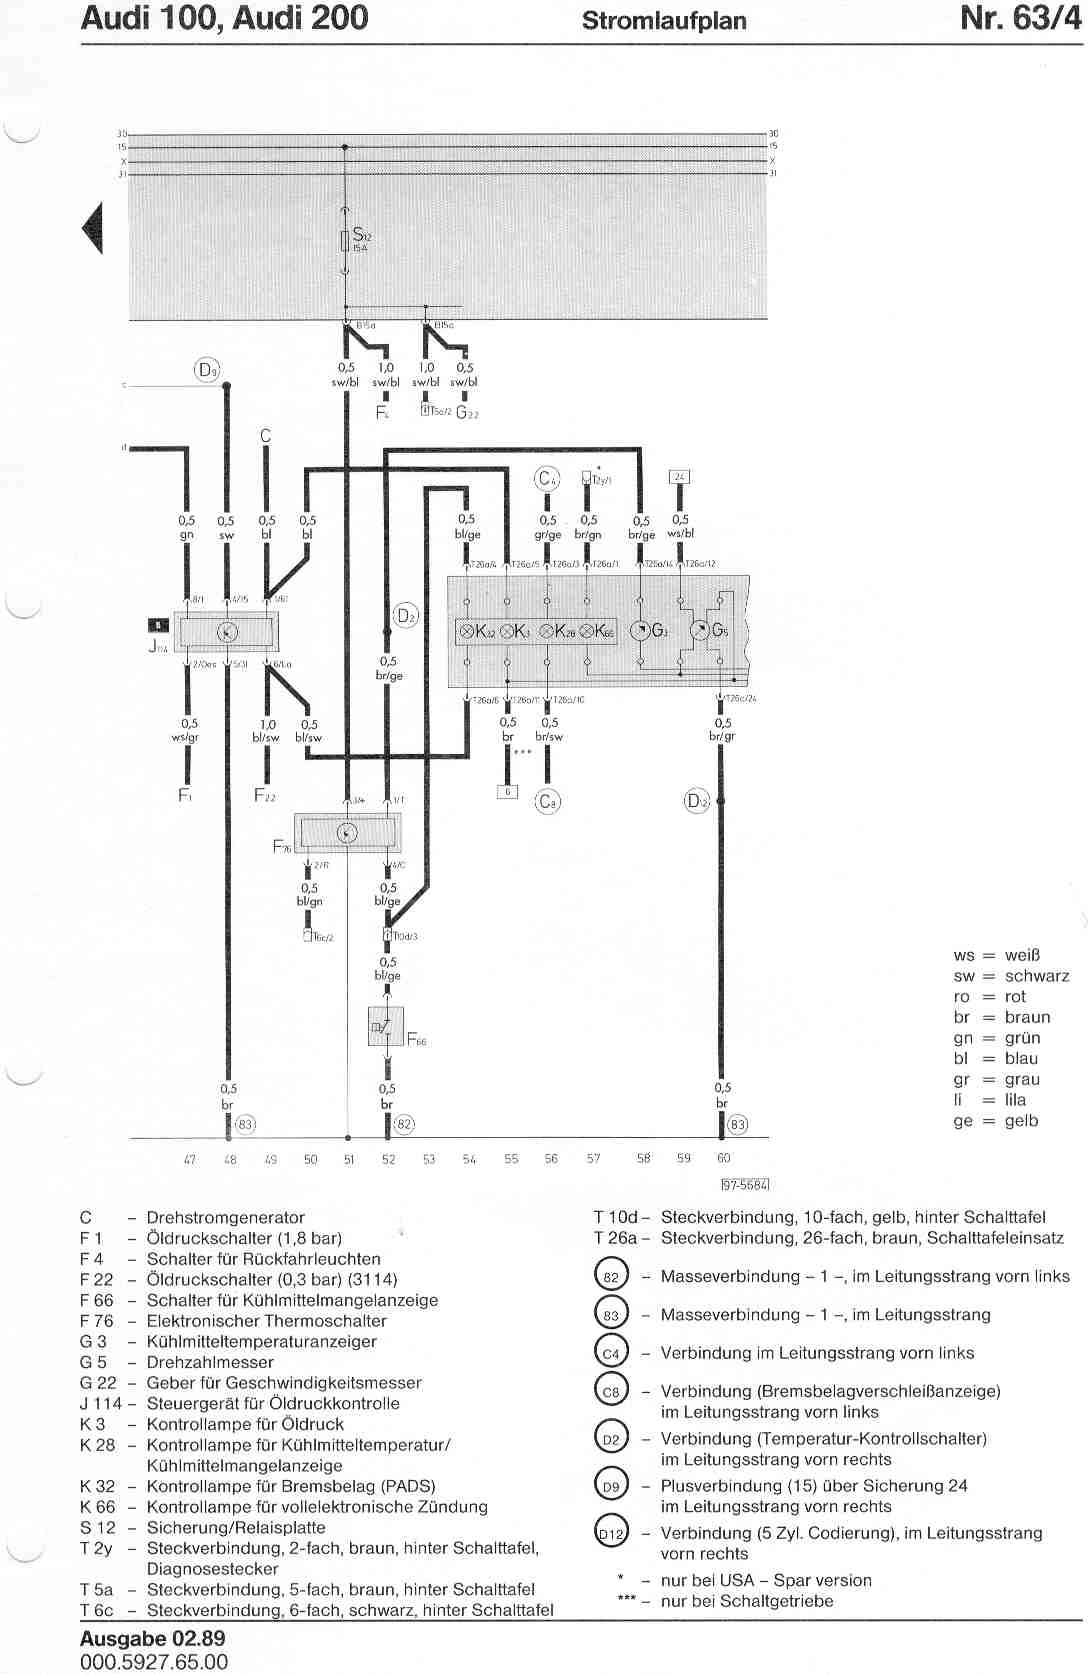 hight resolution of 63 nf engine 100kw 5 cylinder keiii jetronik with knock sensor